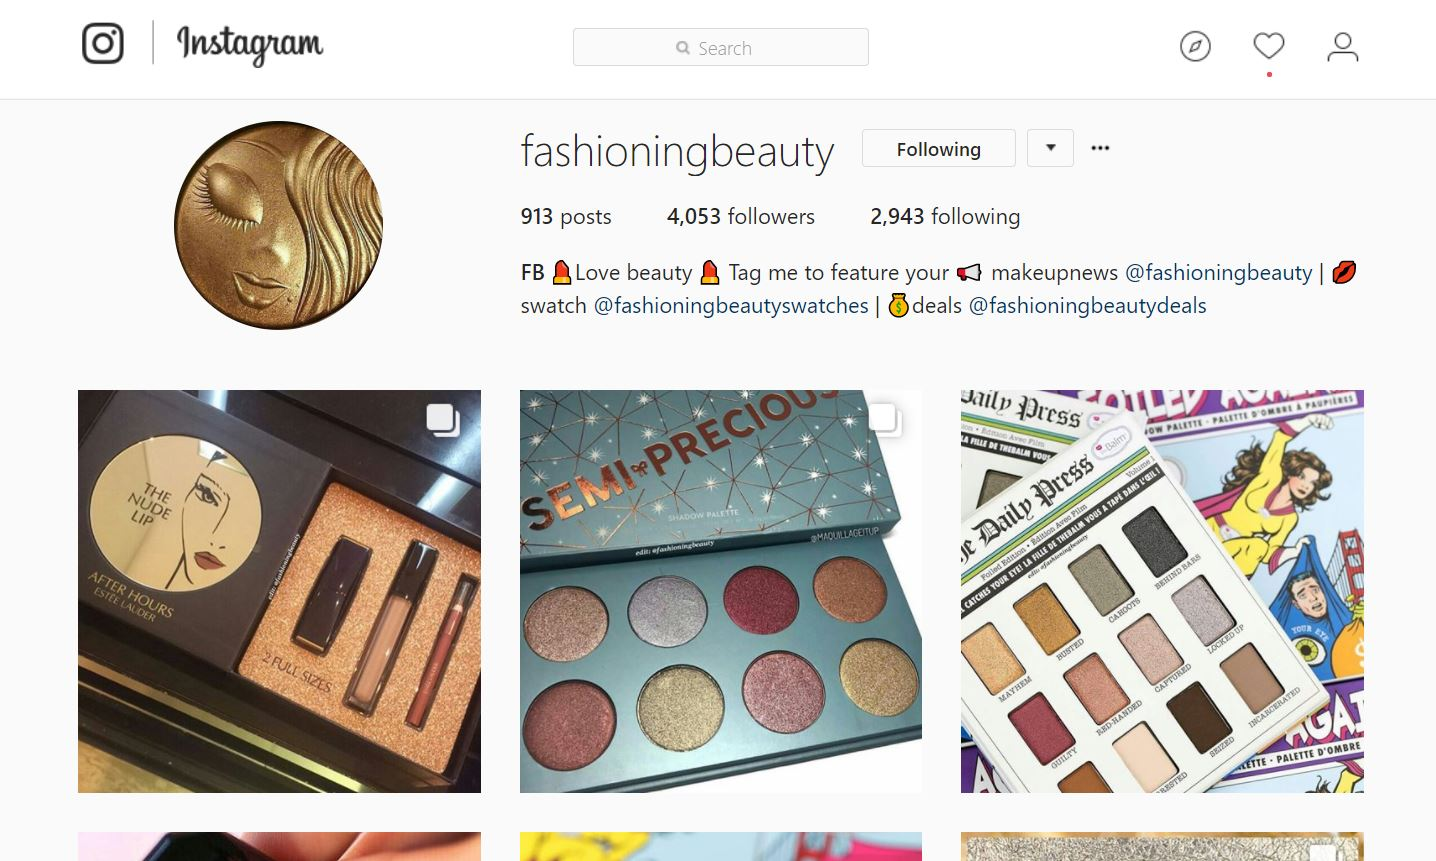 fashioning beauty instagram account